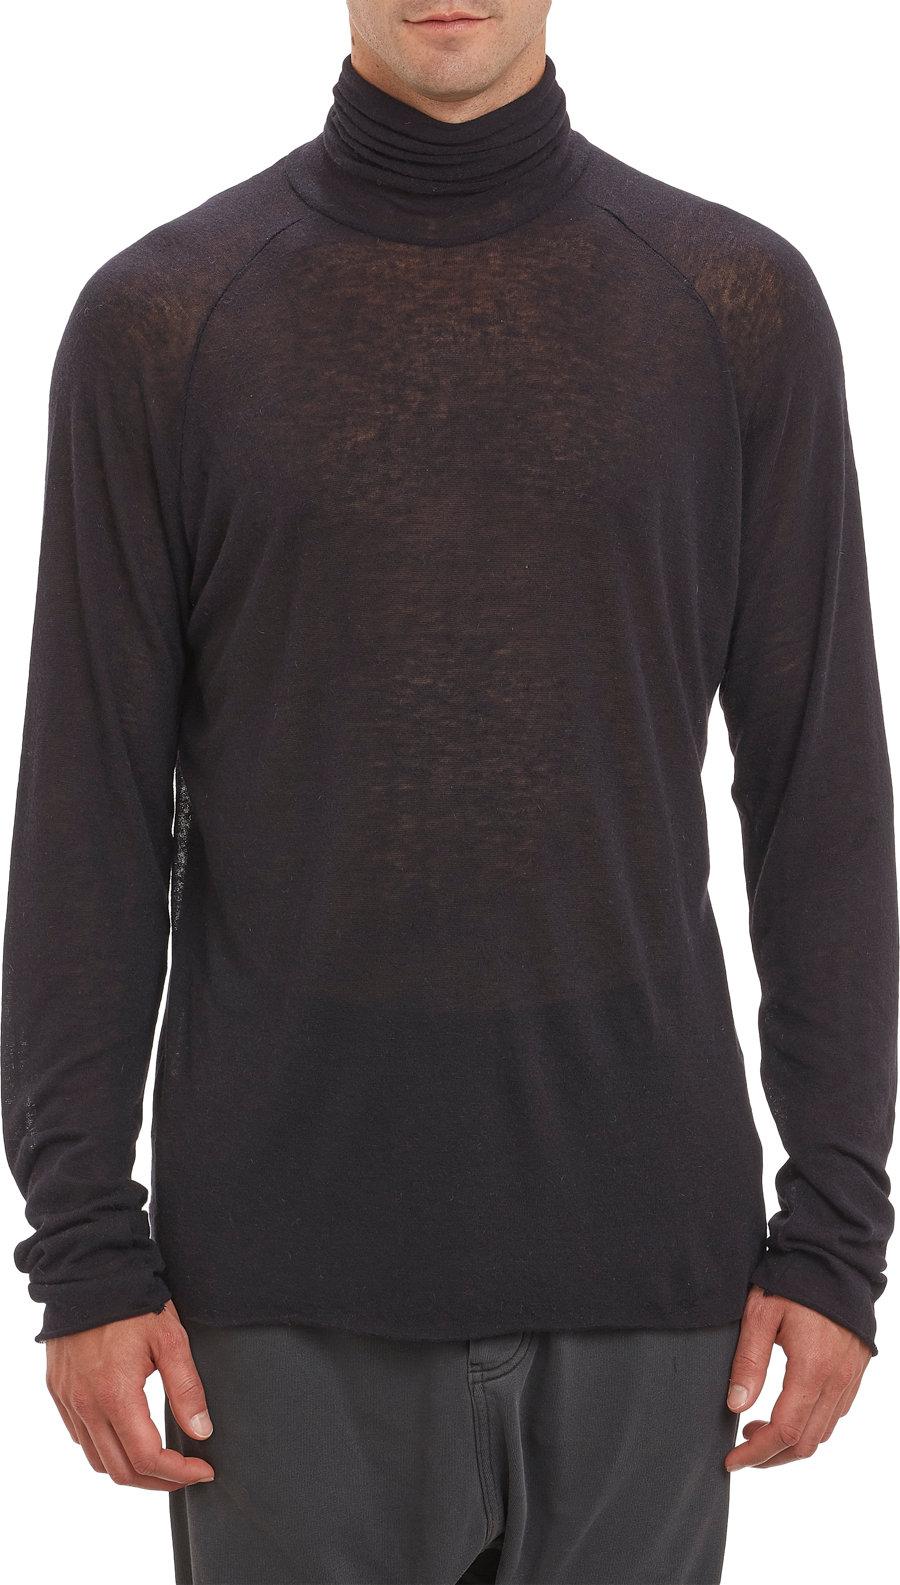 haider ackermann turtleneck pullover sweater in black for. Black Bedroom Furniture Sets. Home Design Ideas